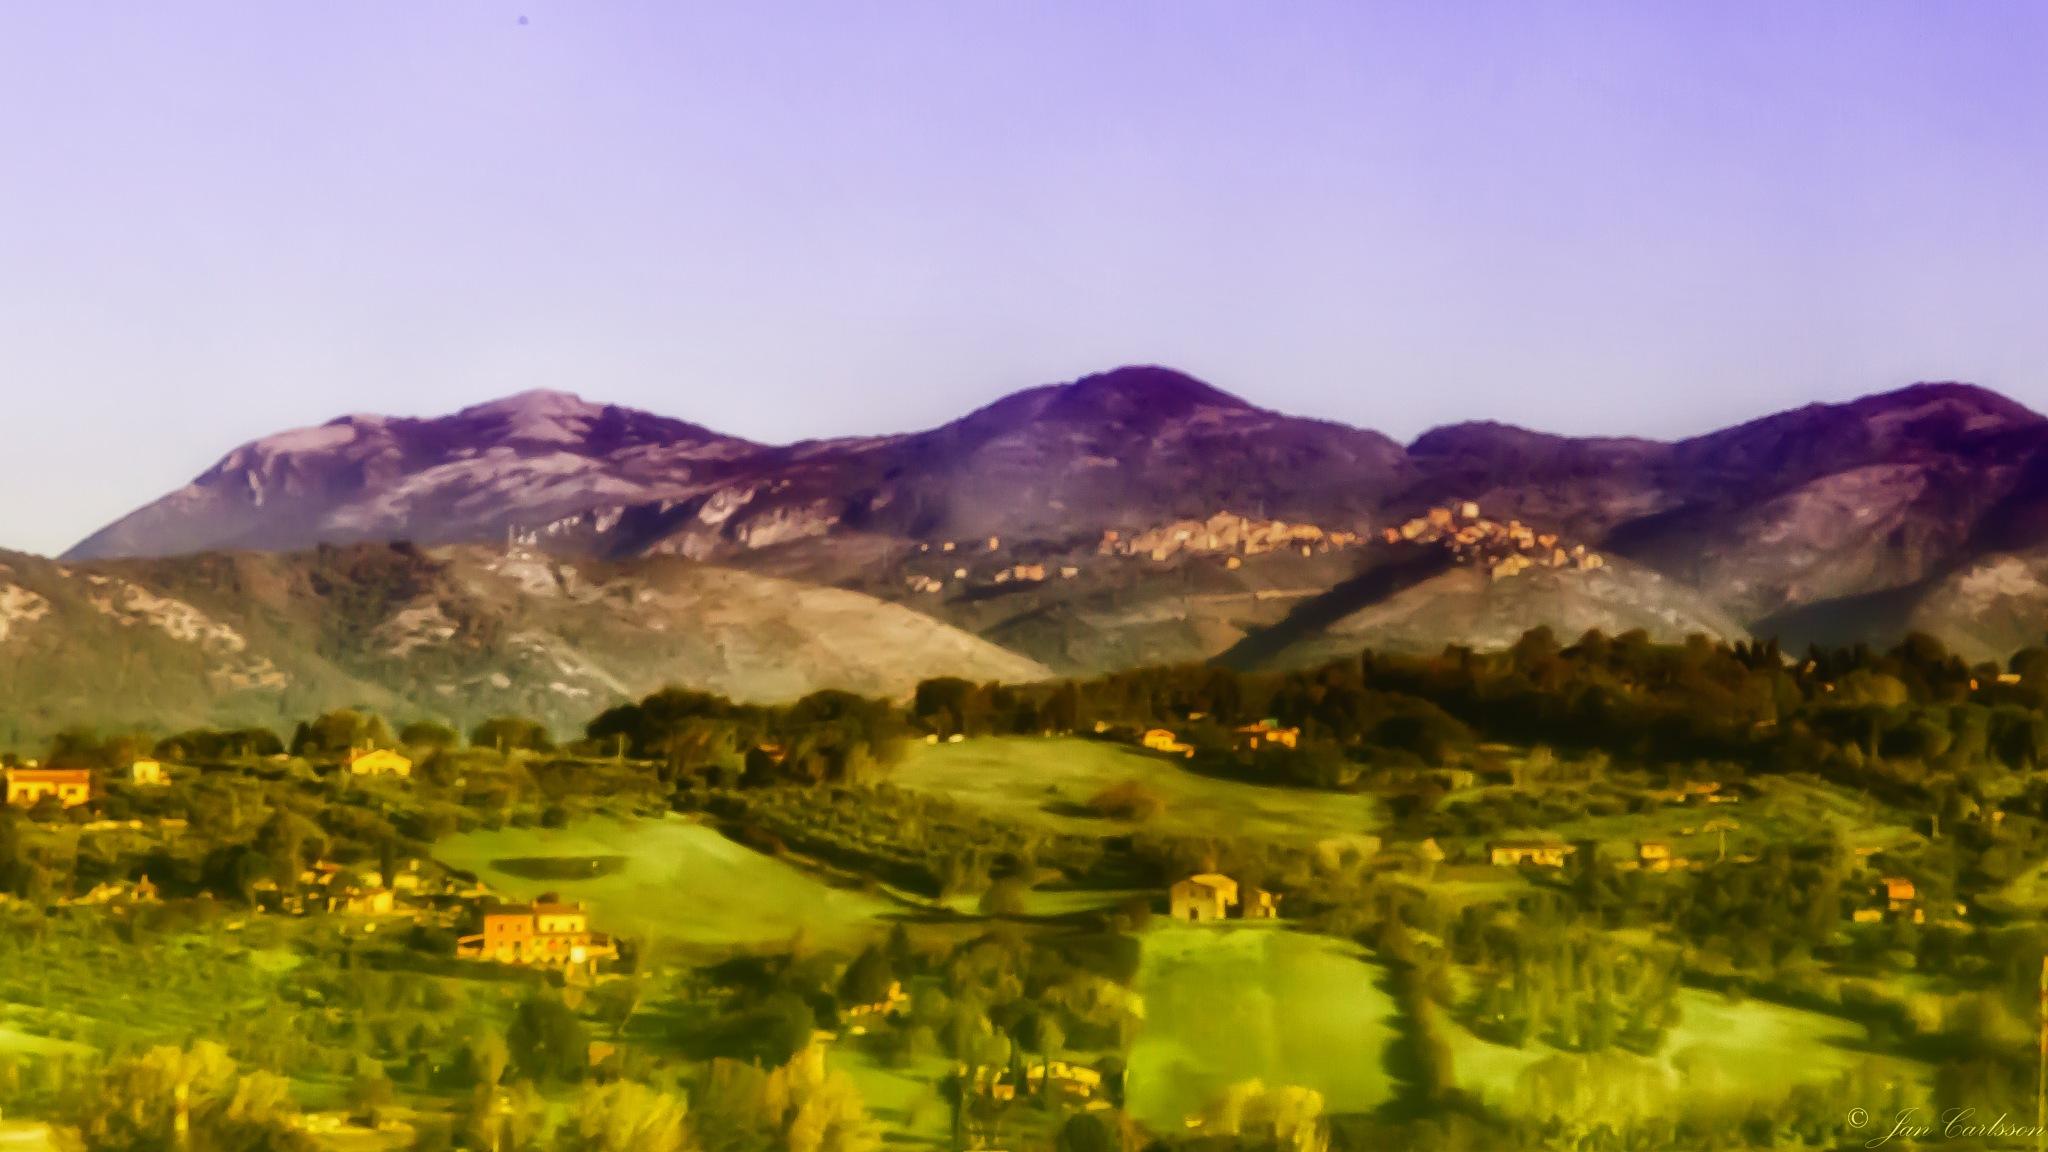 Umbrian Landscape HDR by carljan w carlsson